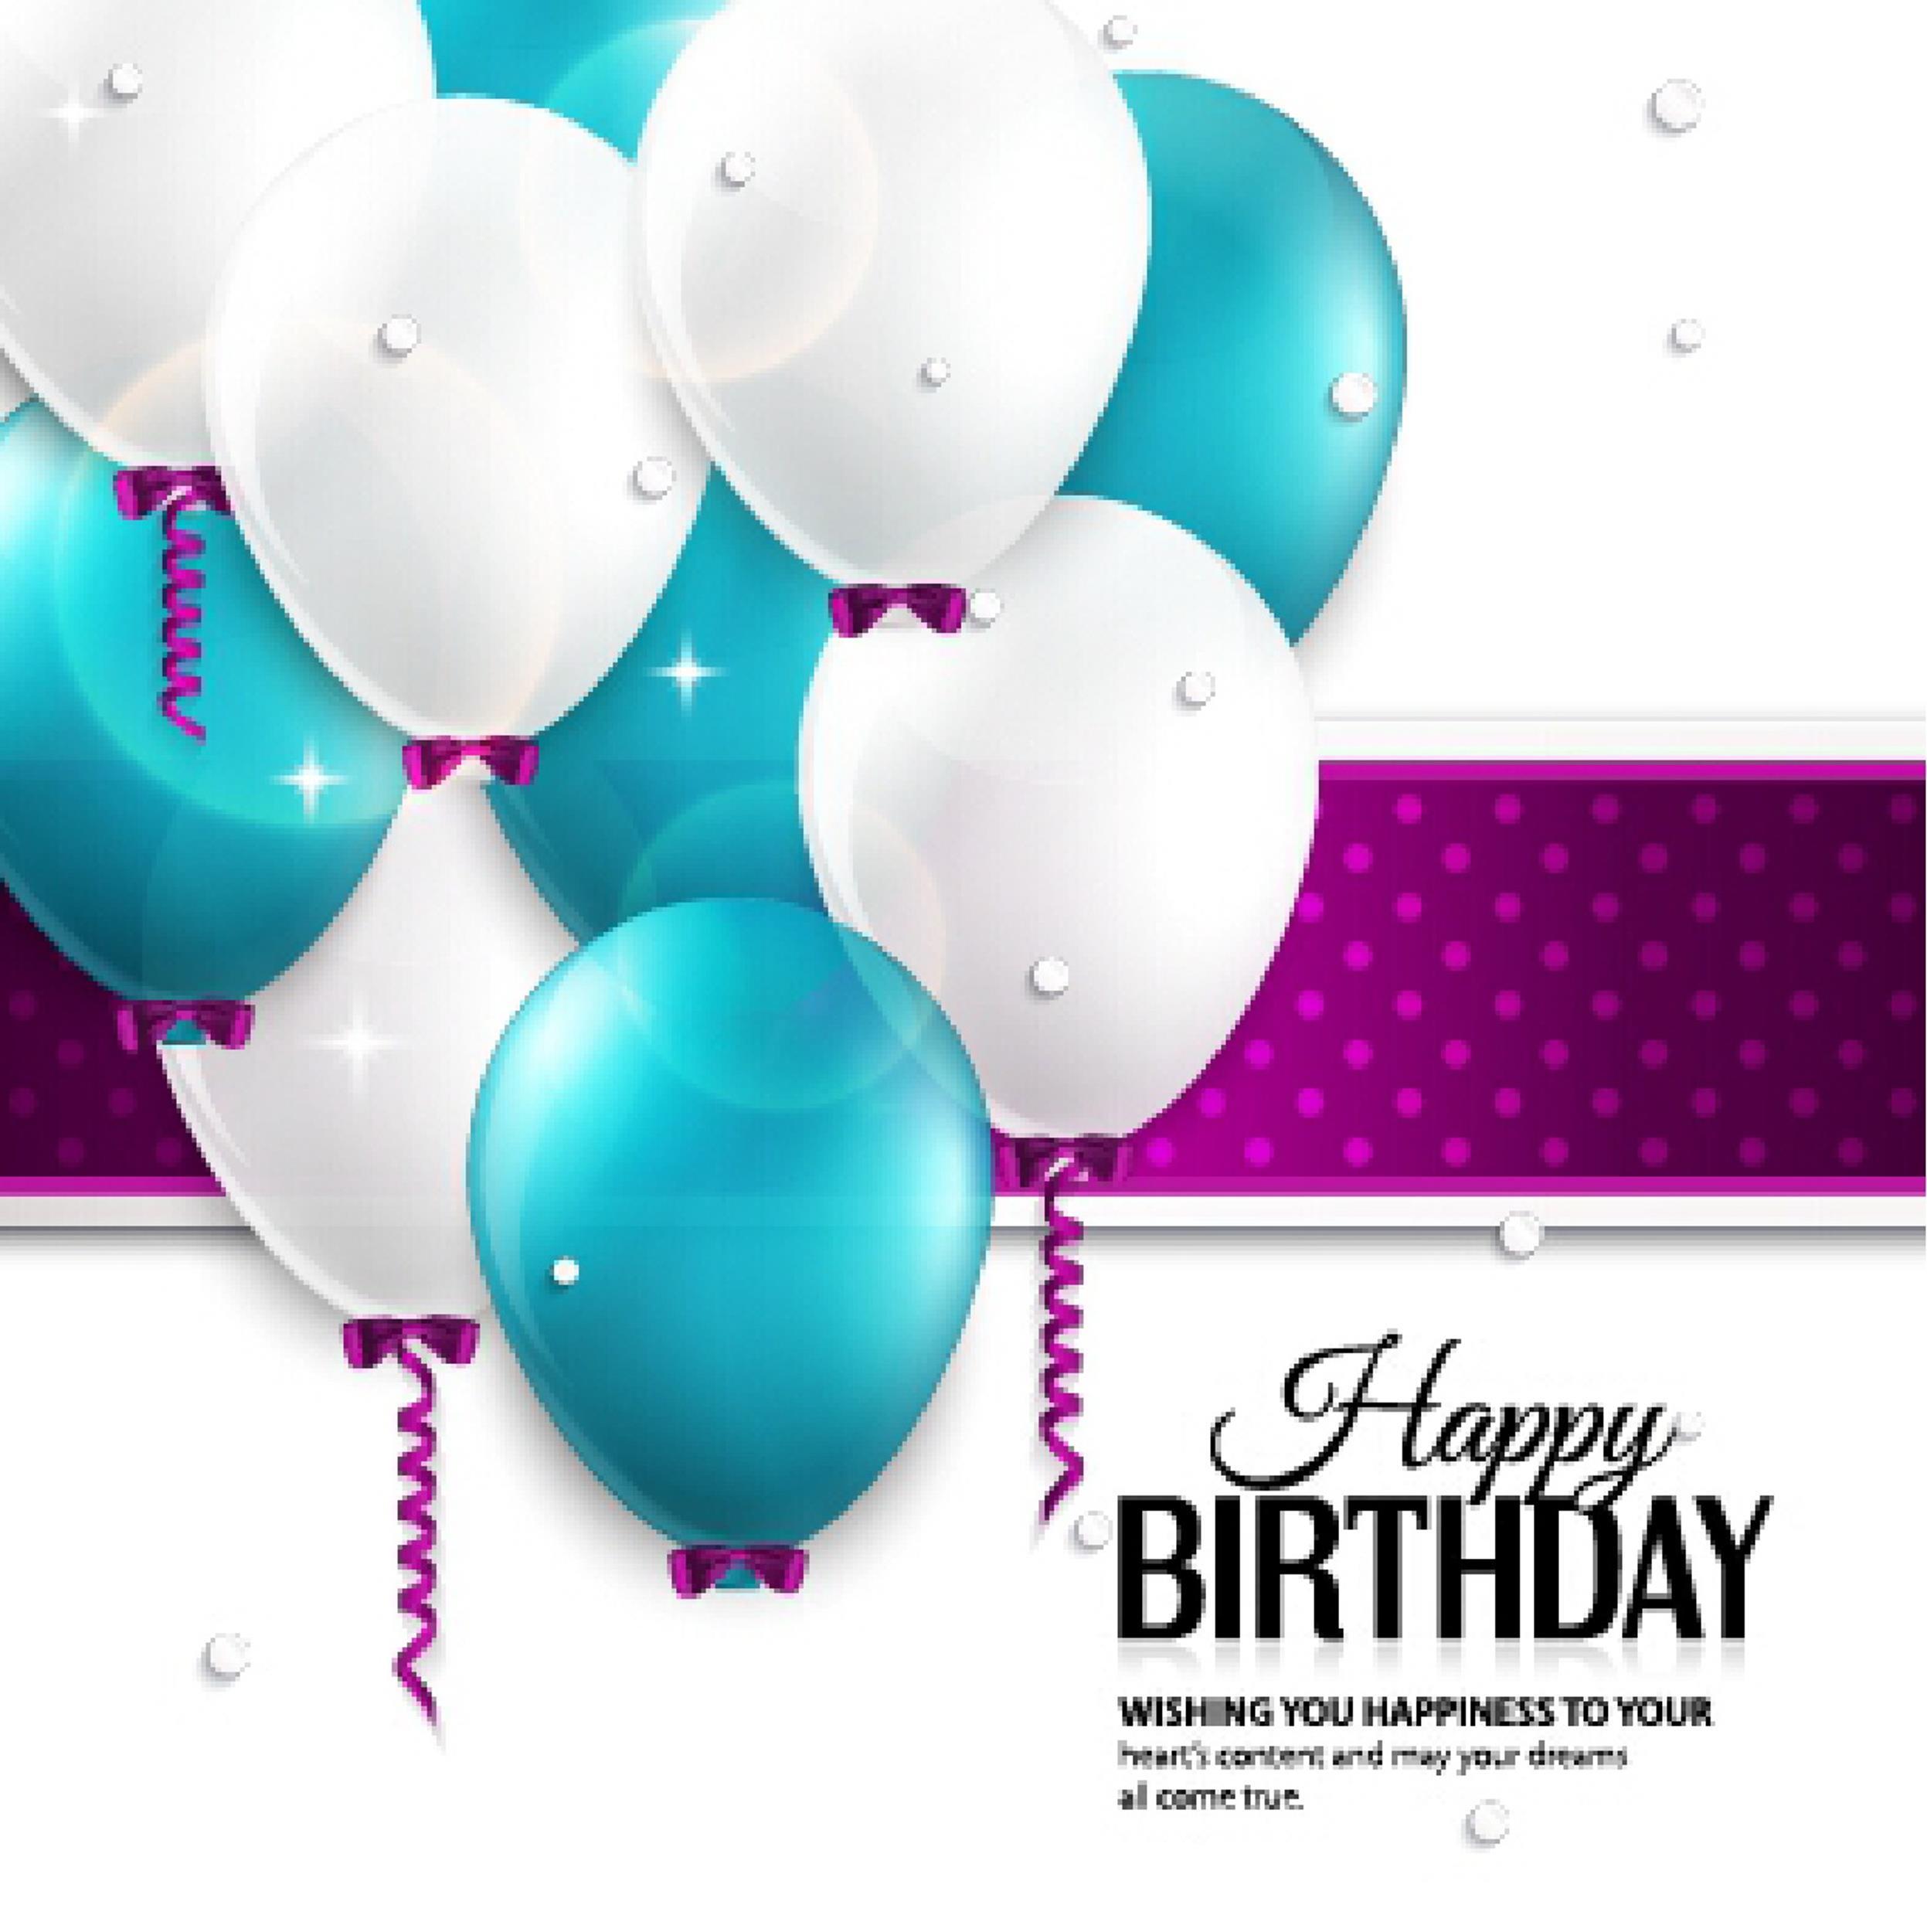 Free birthday card template 36